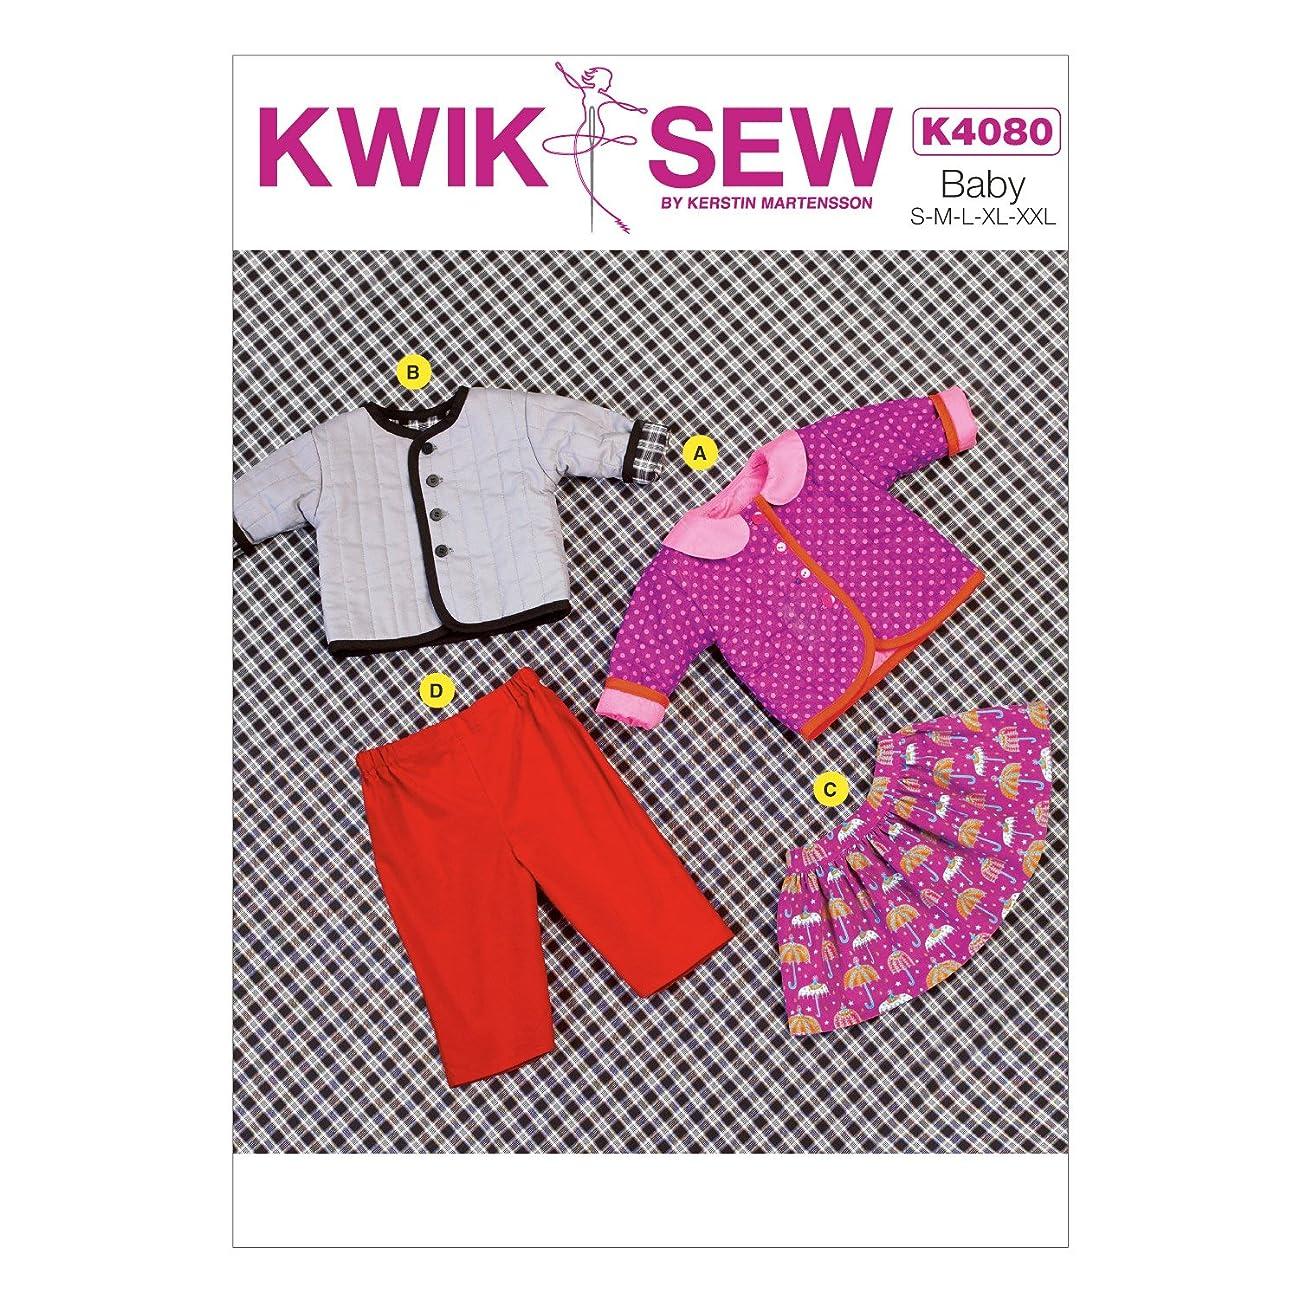 KWIK-SEW PATTERNS K4080 Baby Jacket, Skirt and Pants, All Sizes